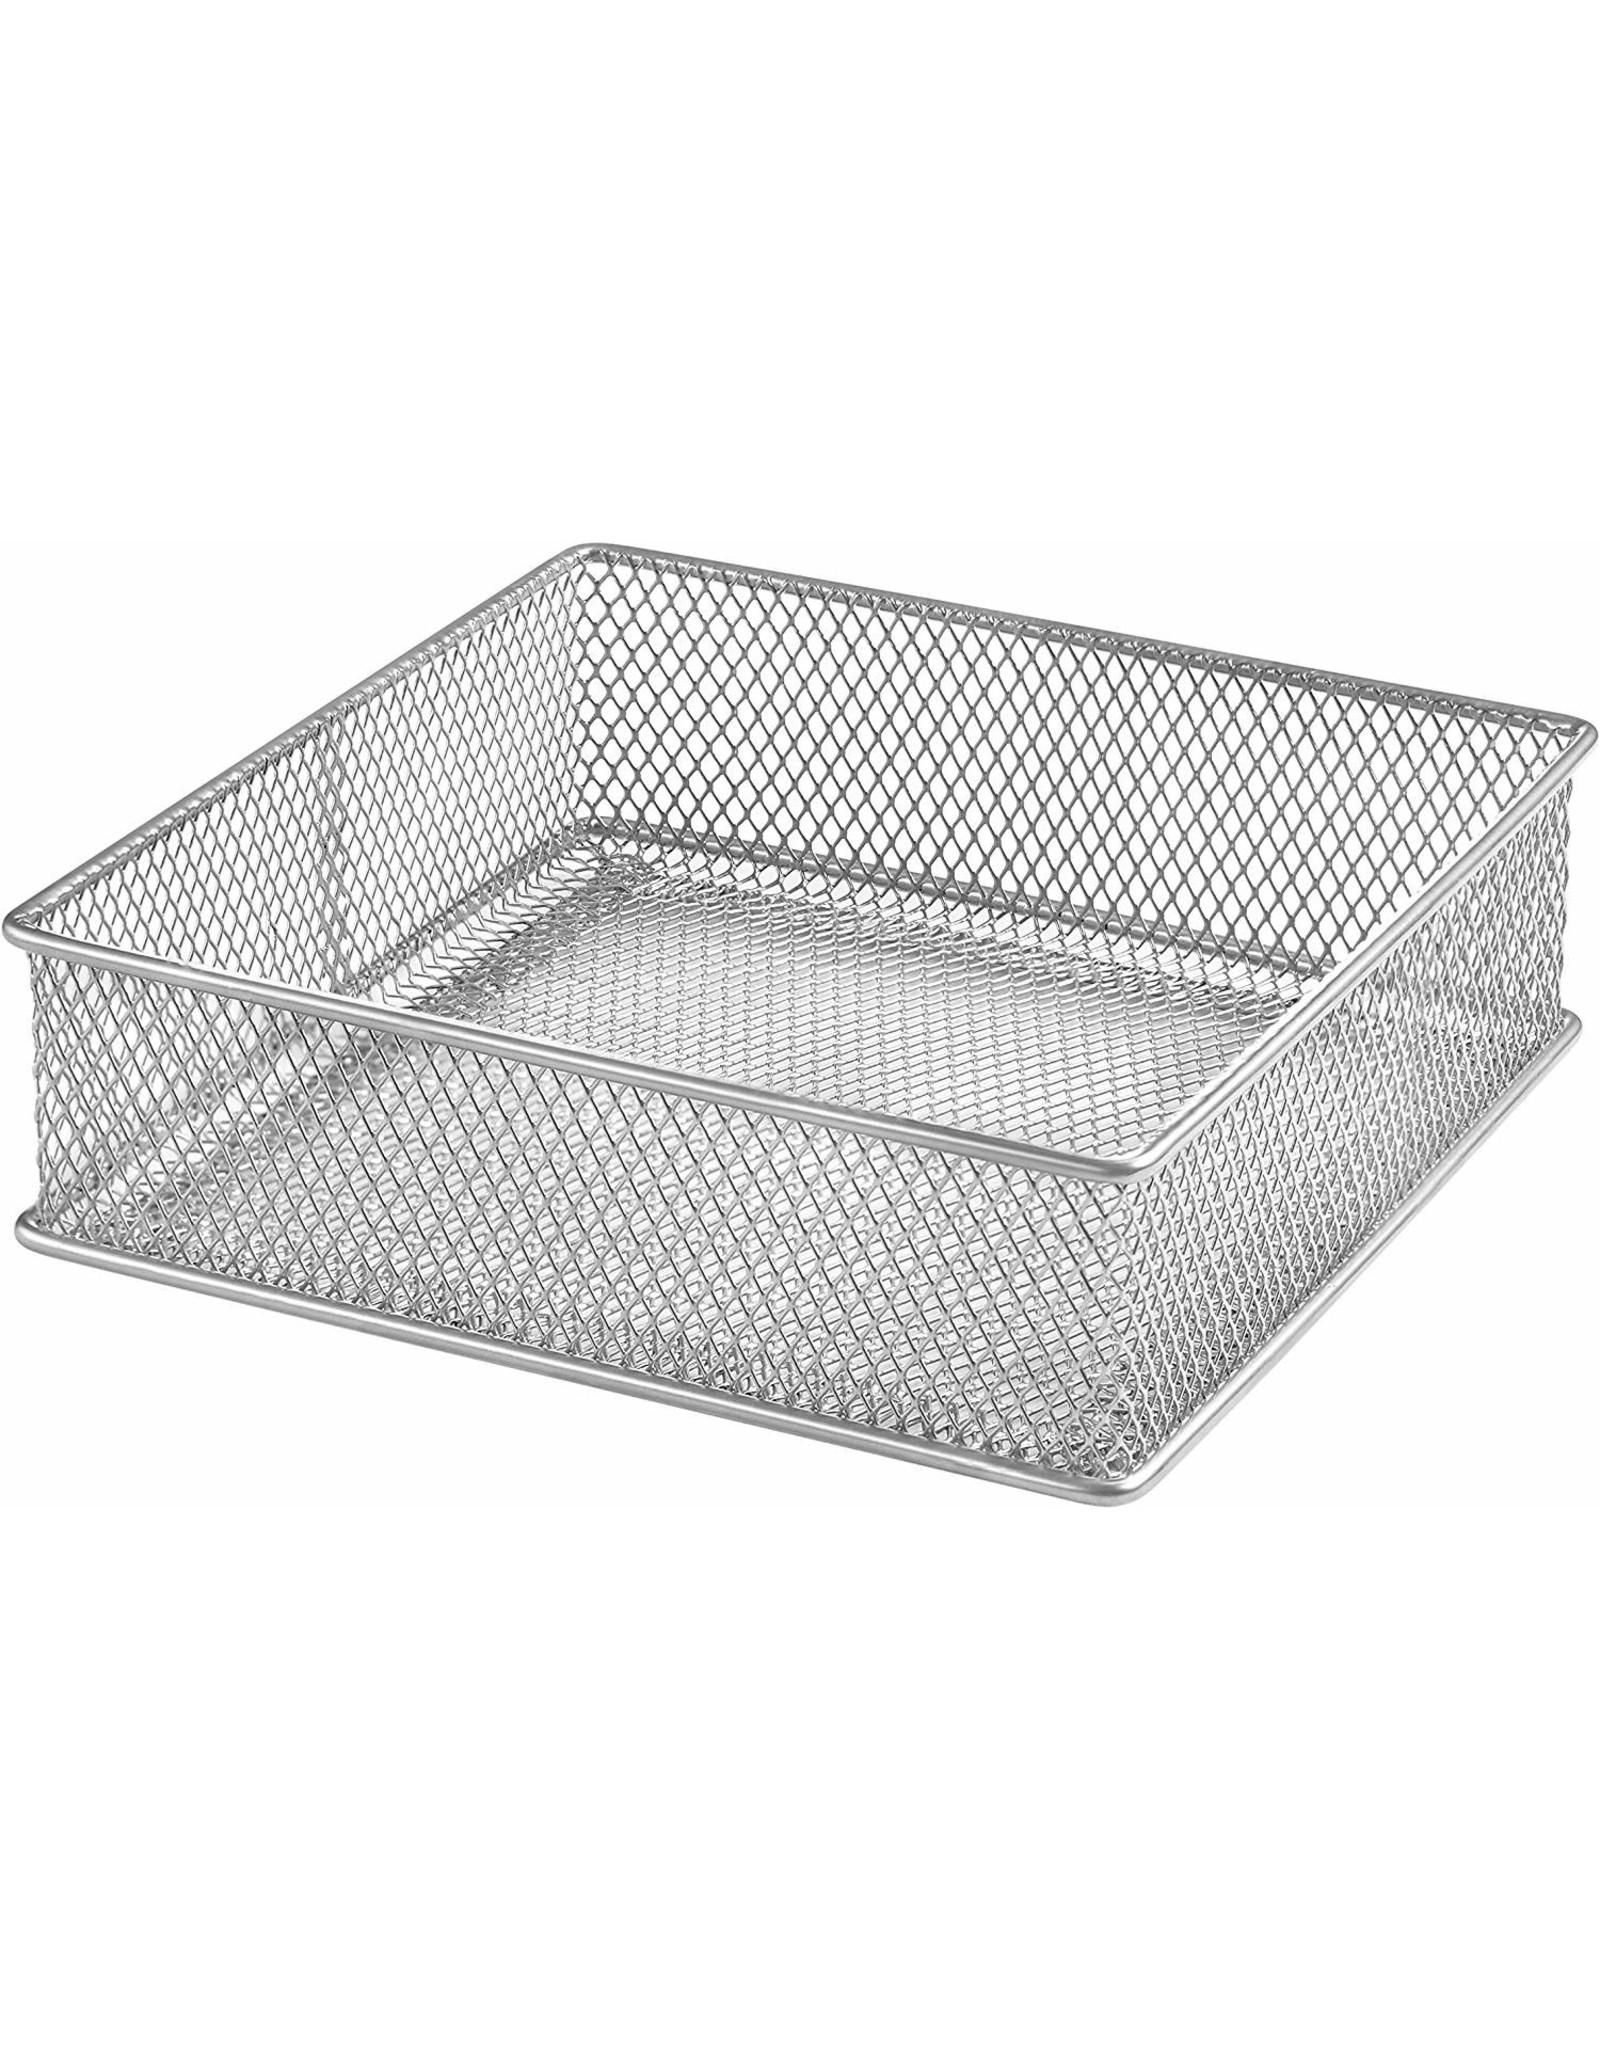 Silver Mesh Organizer Basket 6x6